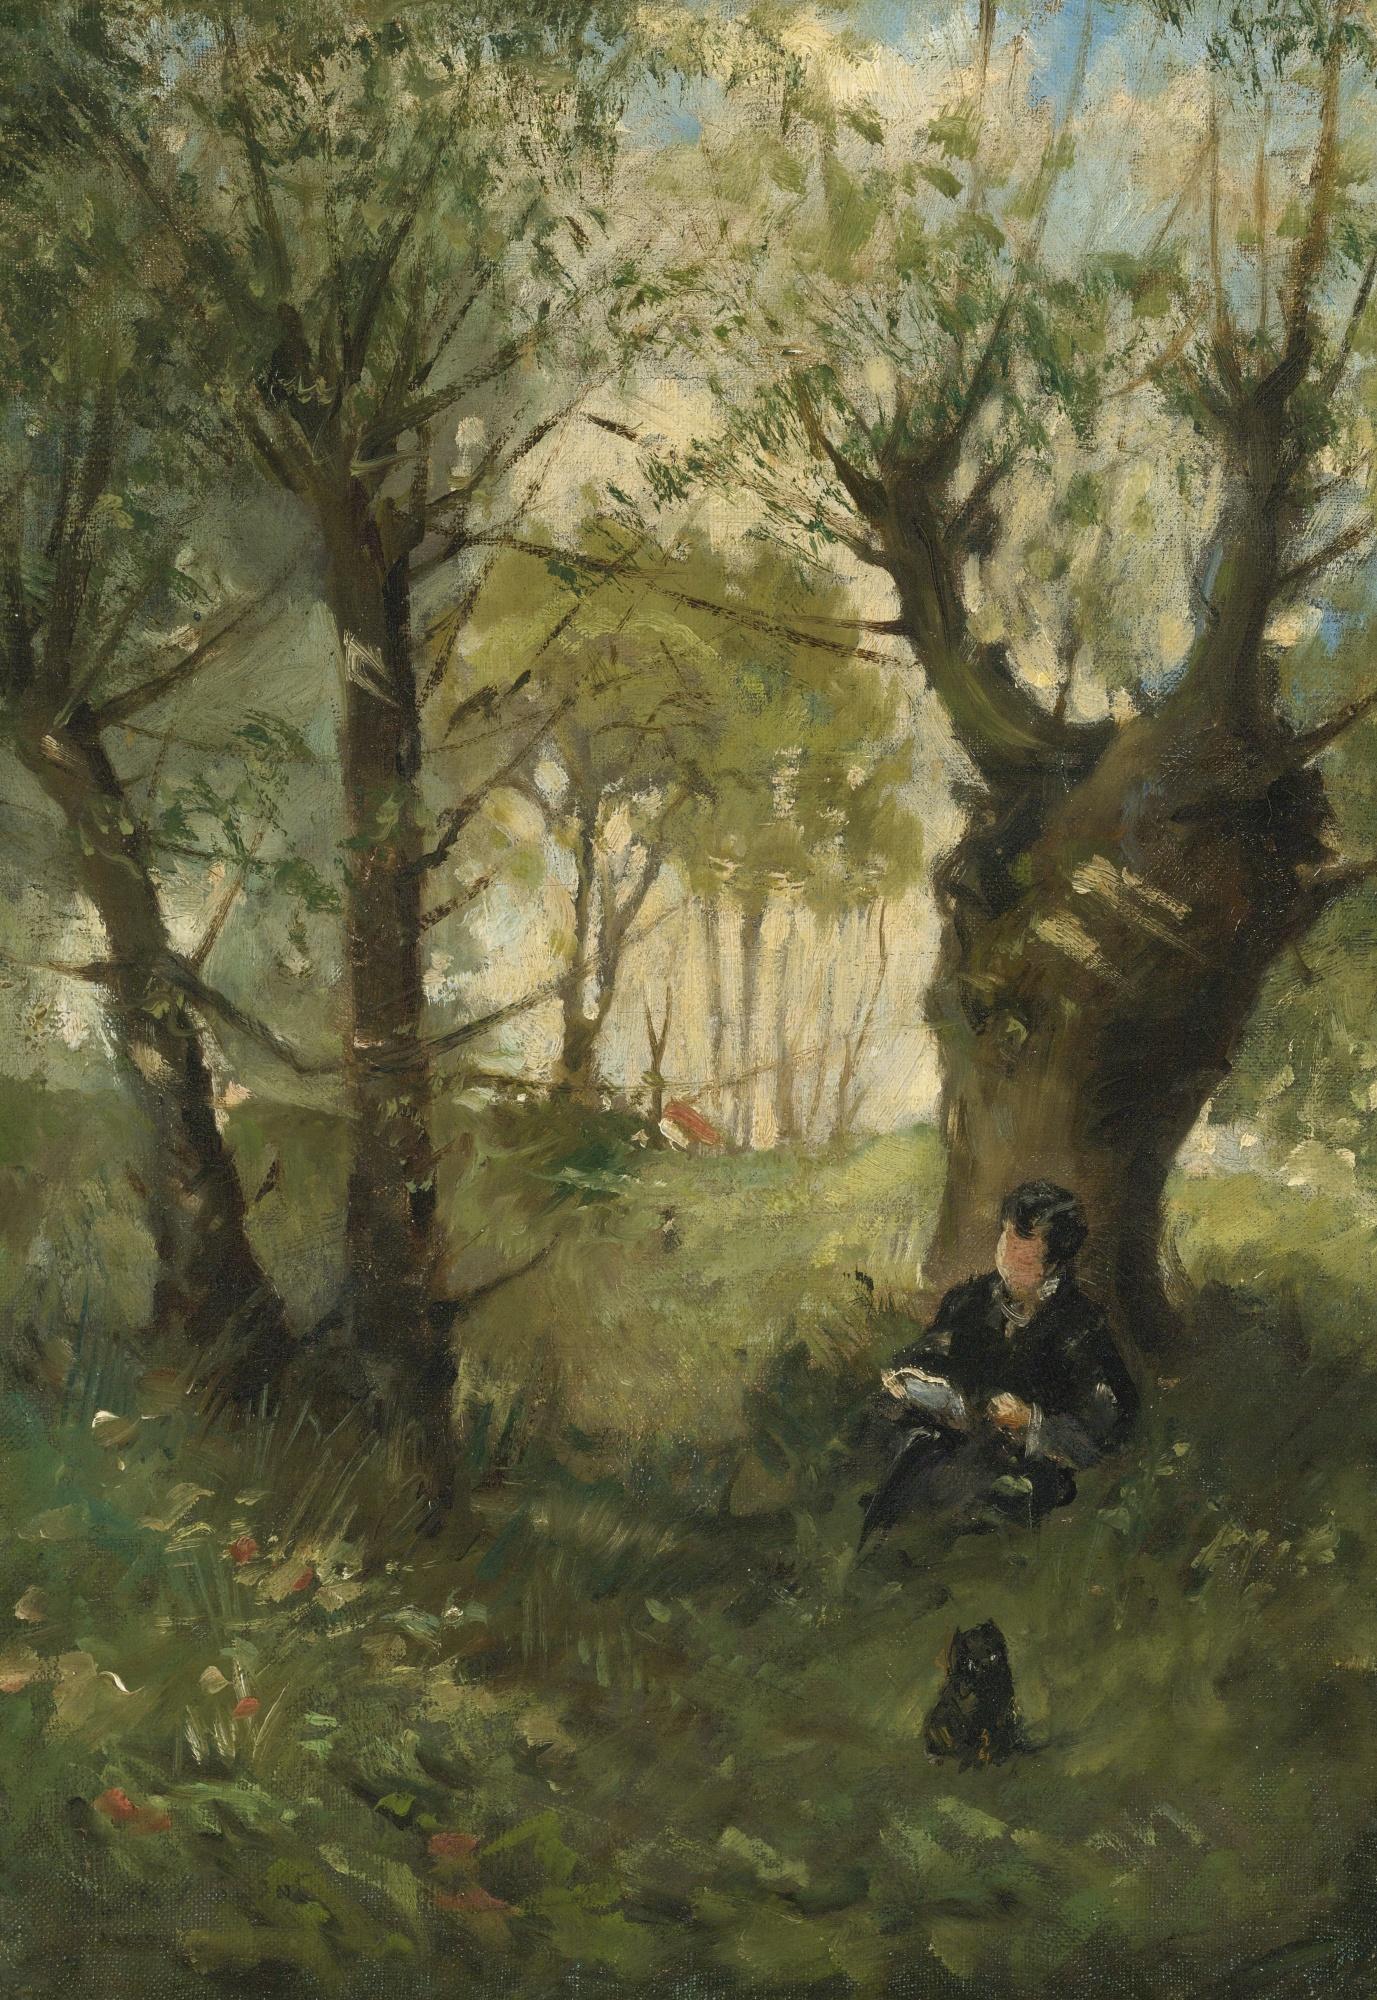 File:Morisot - VIEUX CHEMIN À AUVERS, 1863.jpg - Wikimedia Commons